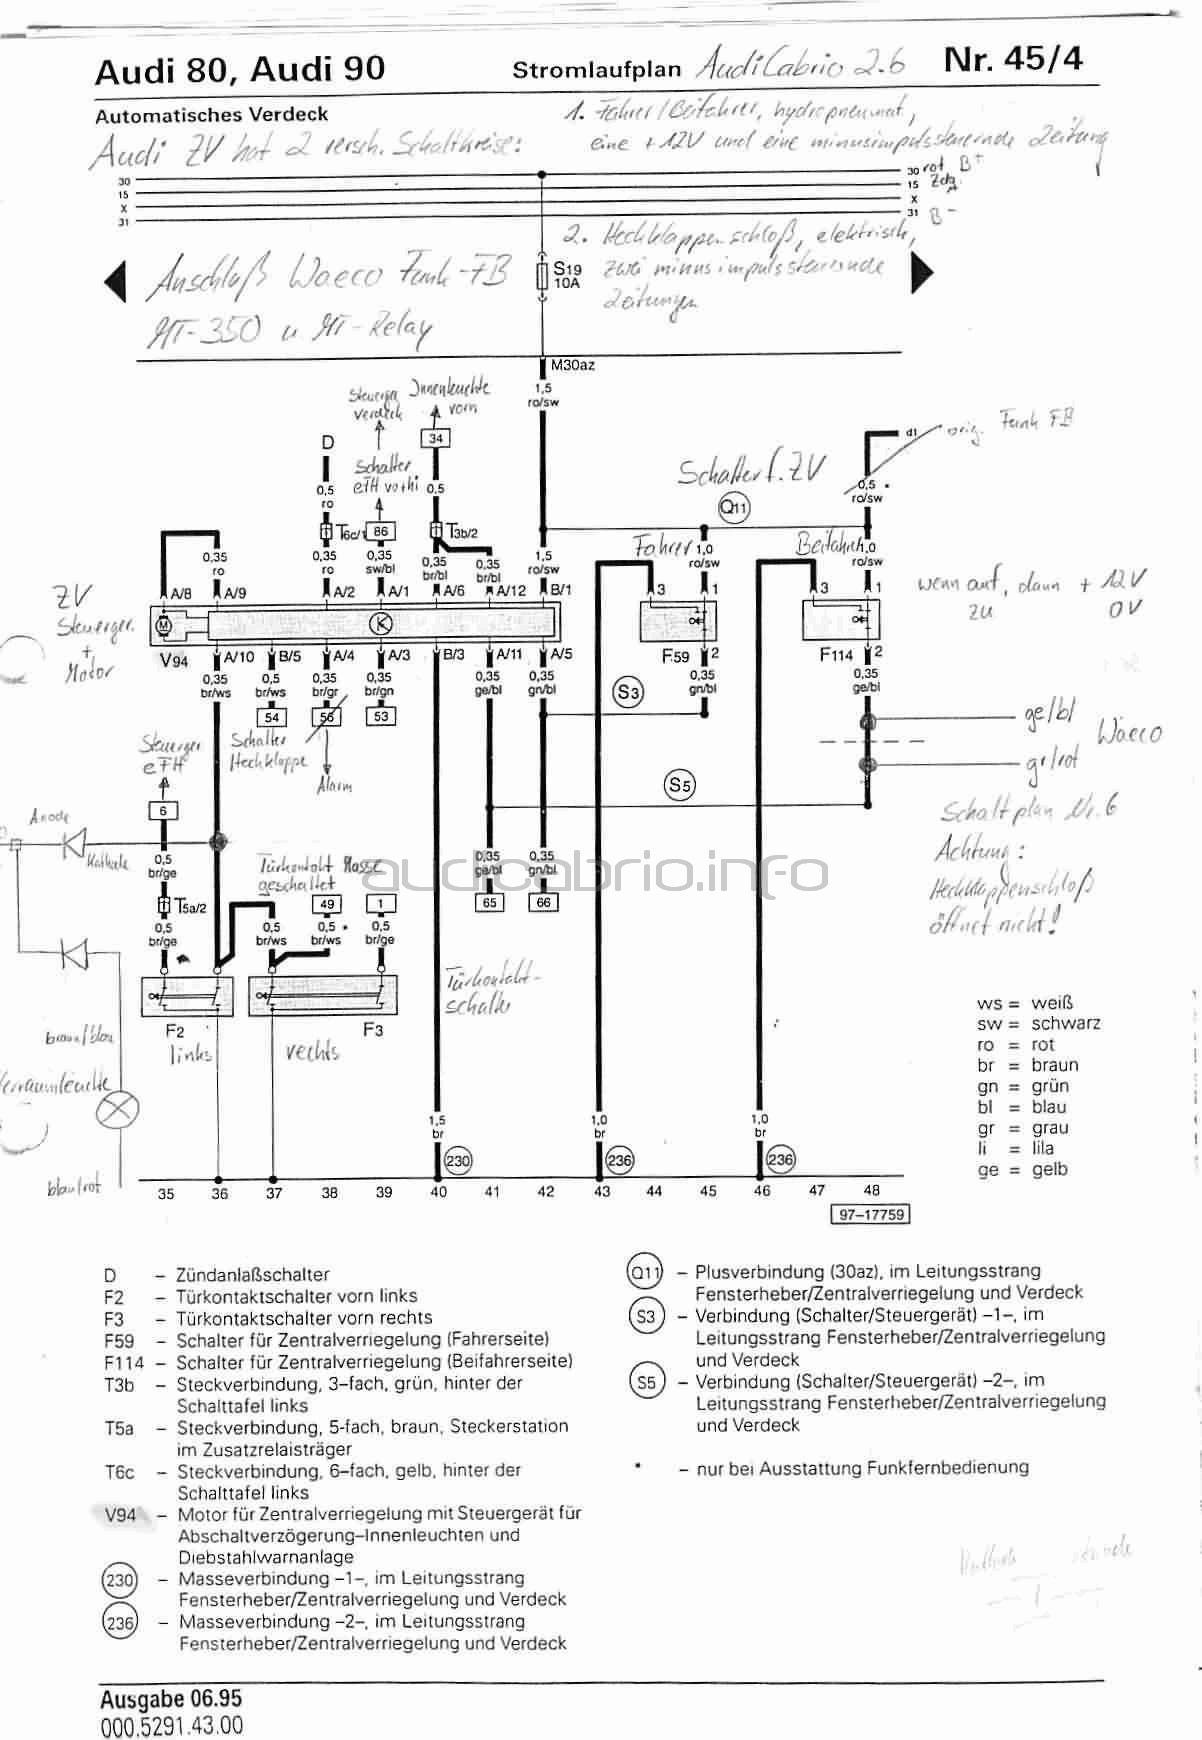 elektrisches verdeck waeco funk zv waeco mt relais relay. Black Bedroom Furniture Sets. Home Design Ideas